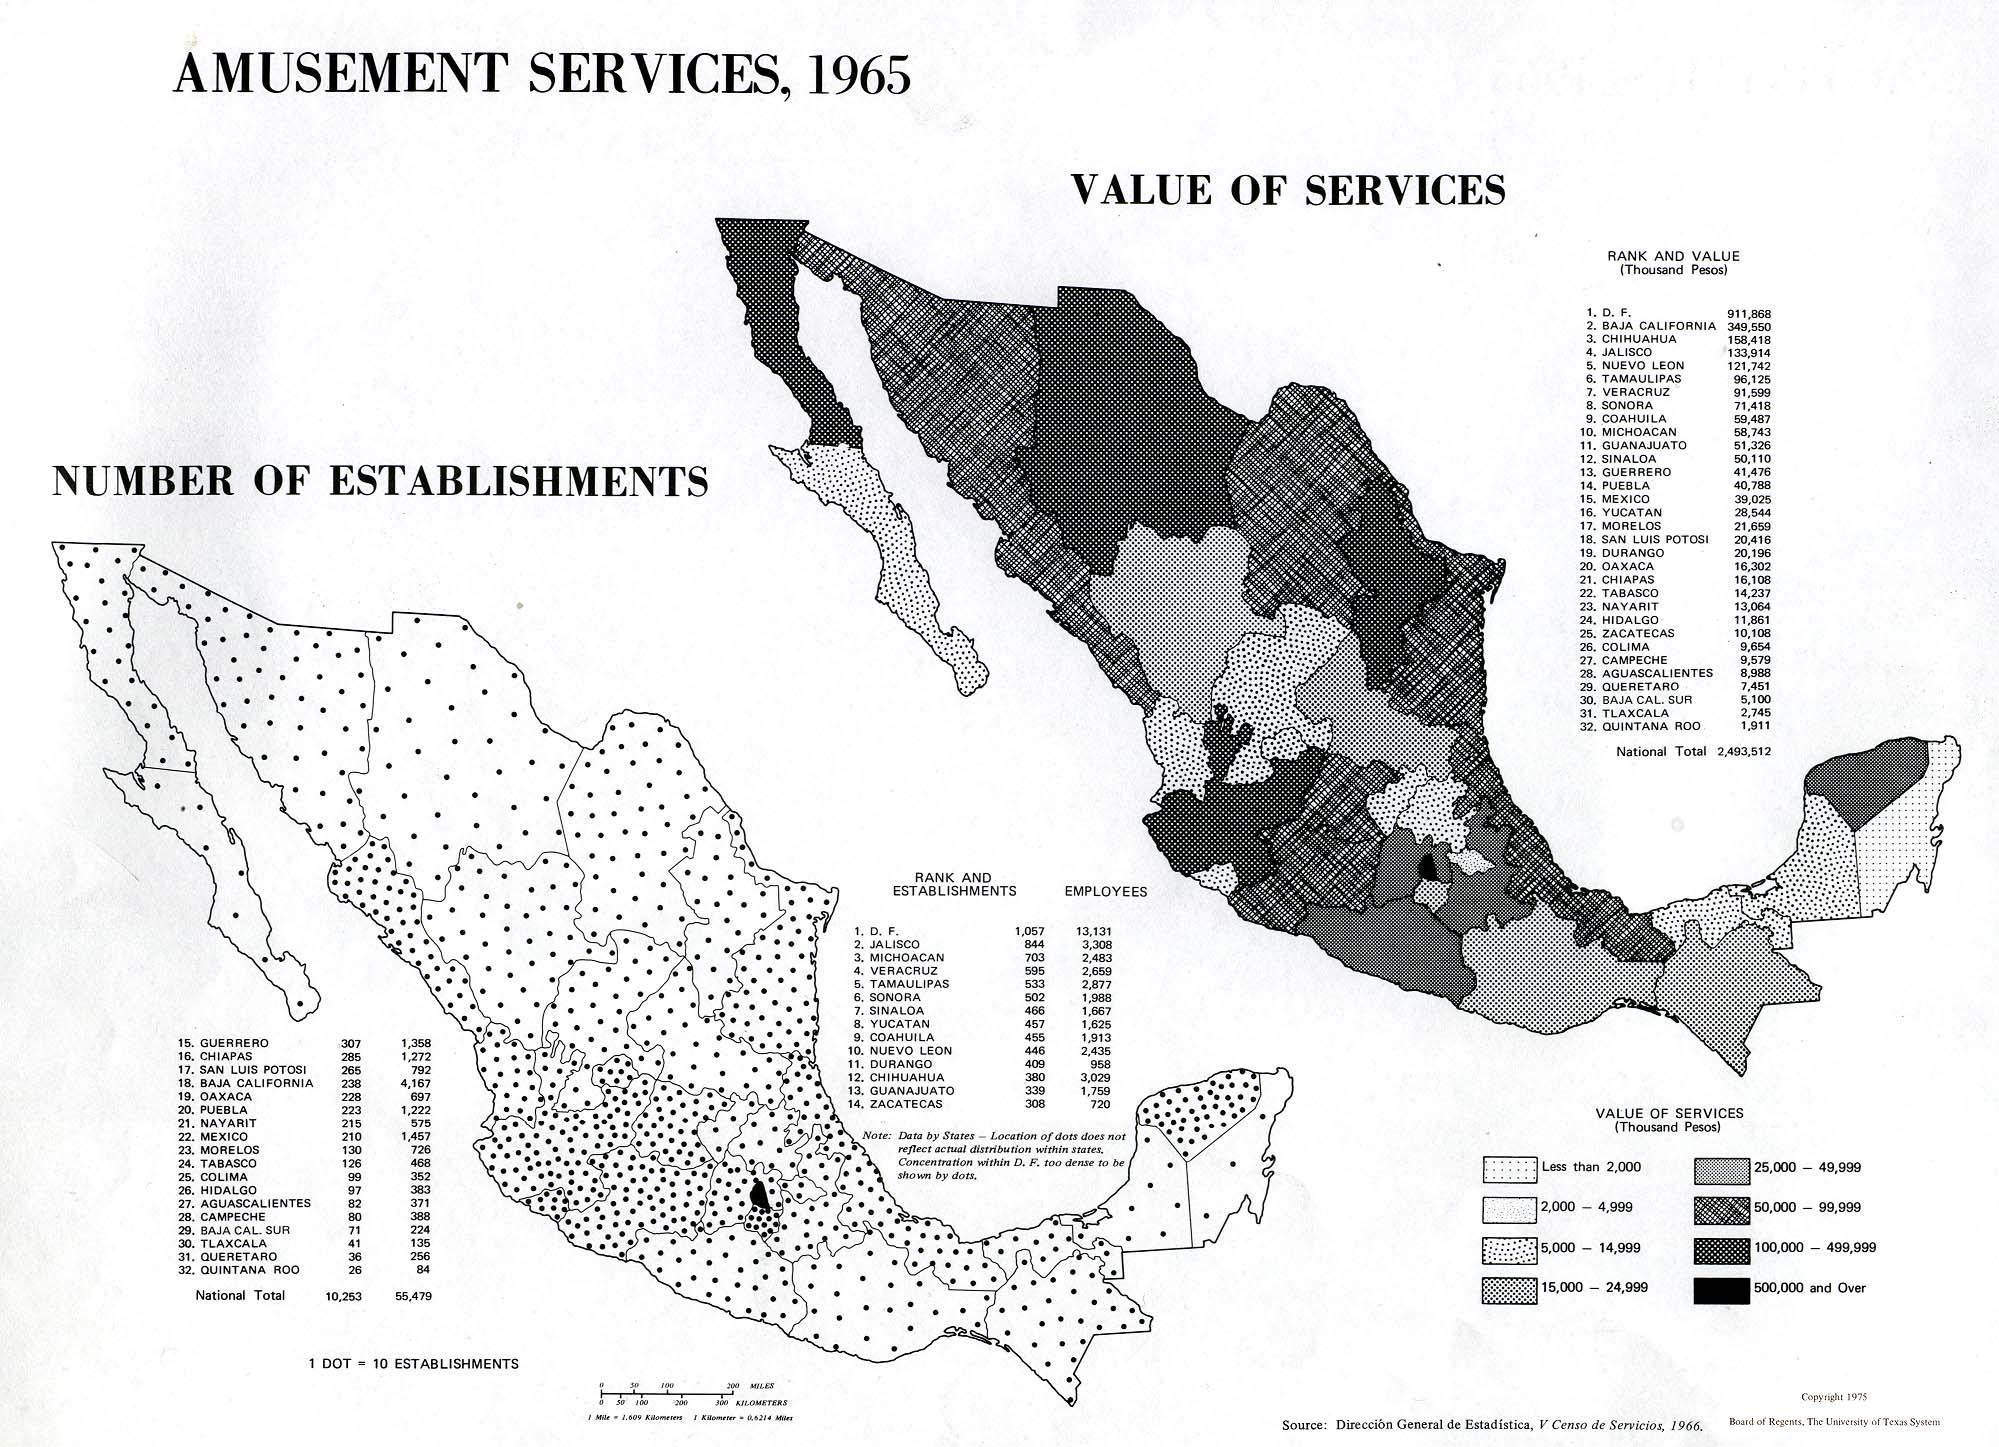 Amusement Services in Mexico 1965